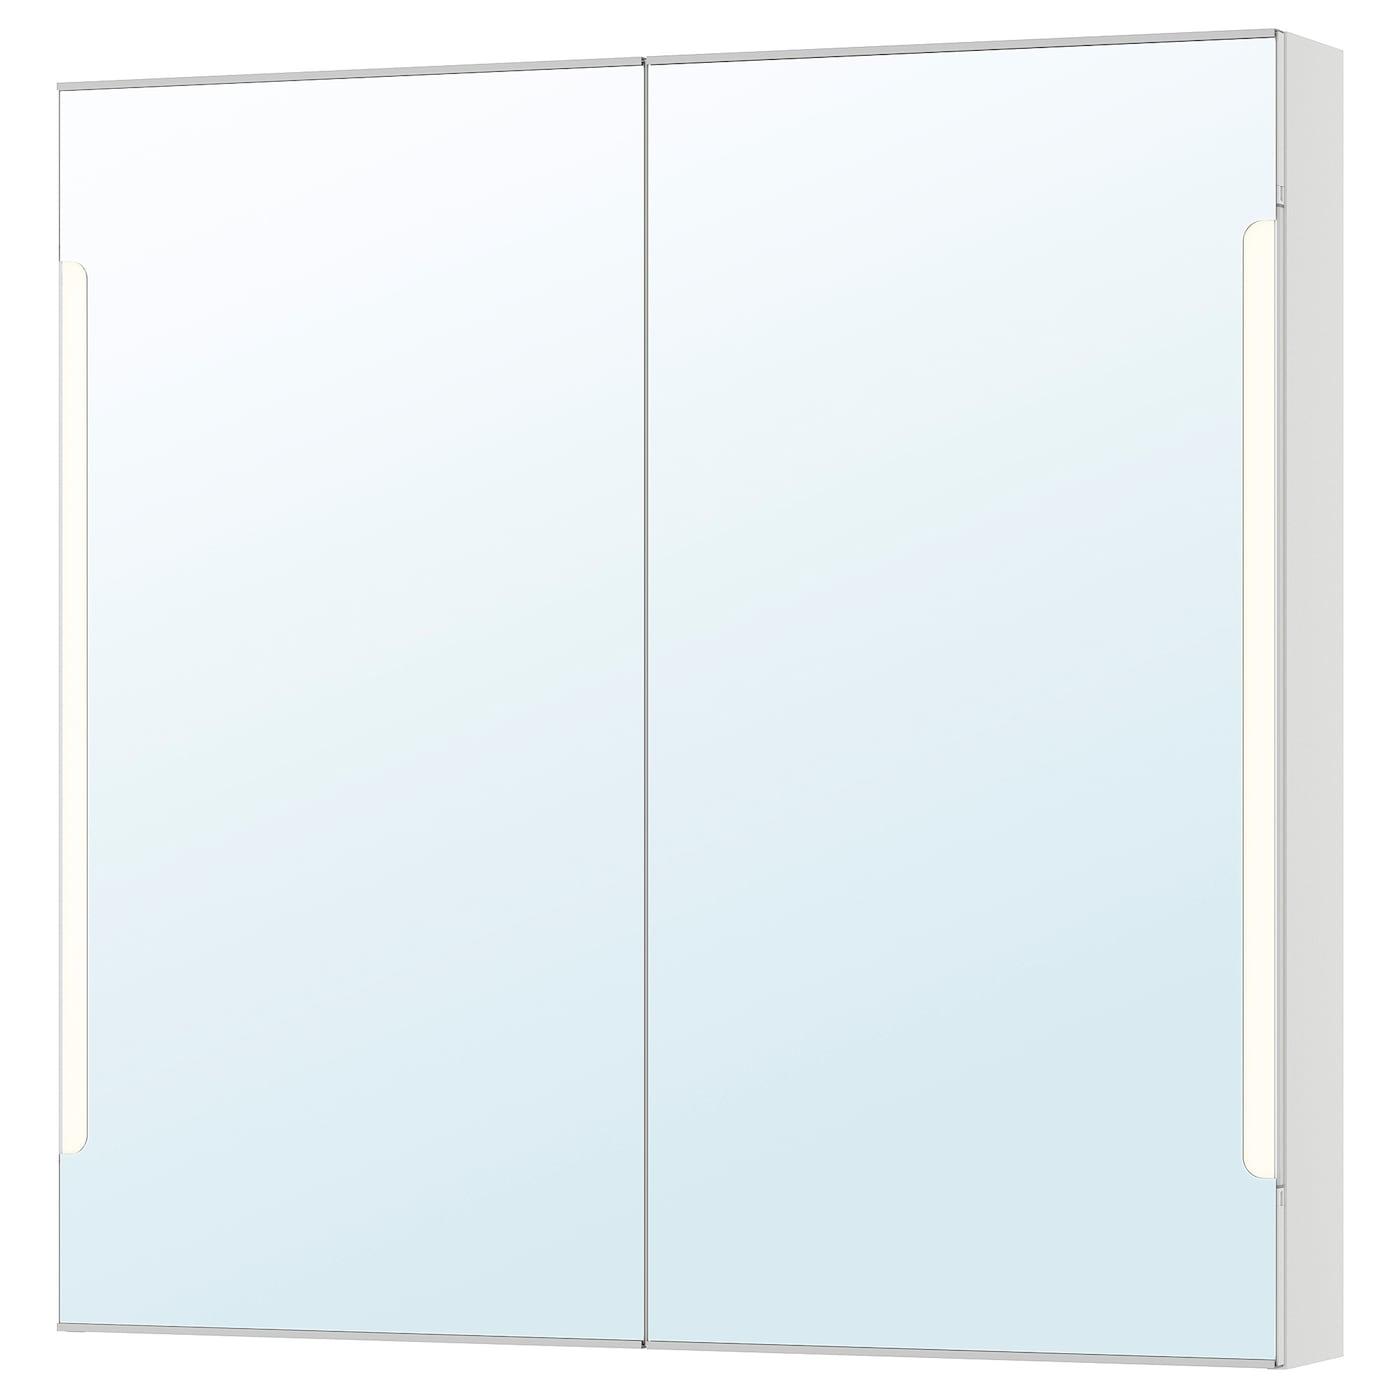 "STORJORM Mirror cabinet w/5 doors & light - white 5 5/5x5 5/5x57 5/5 """